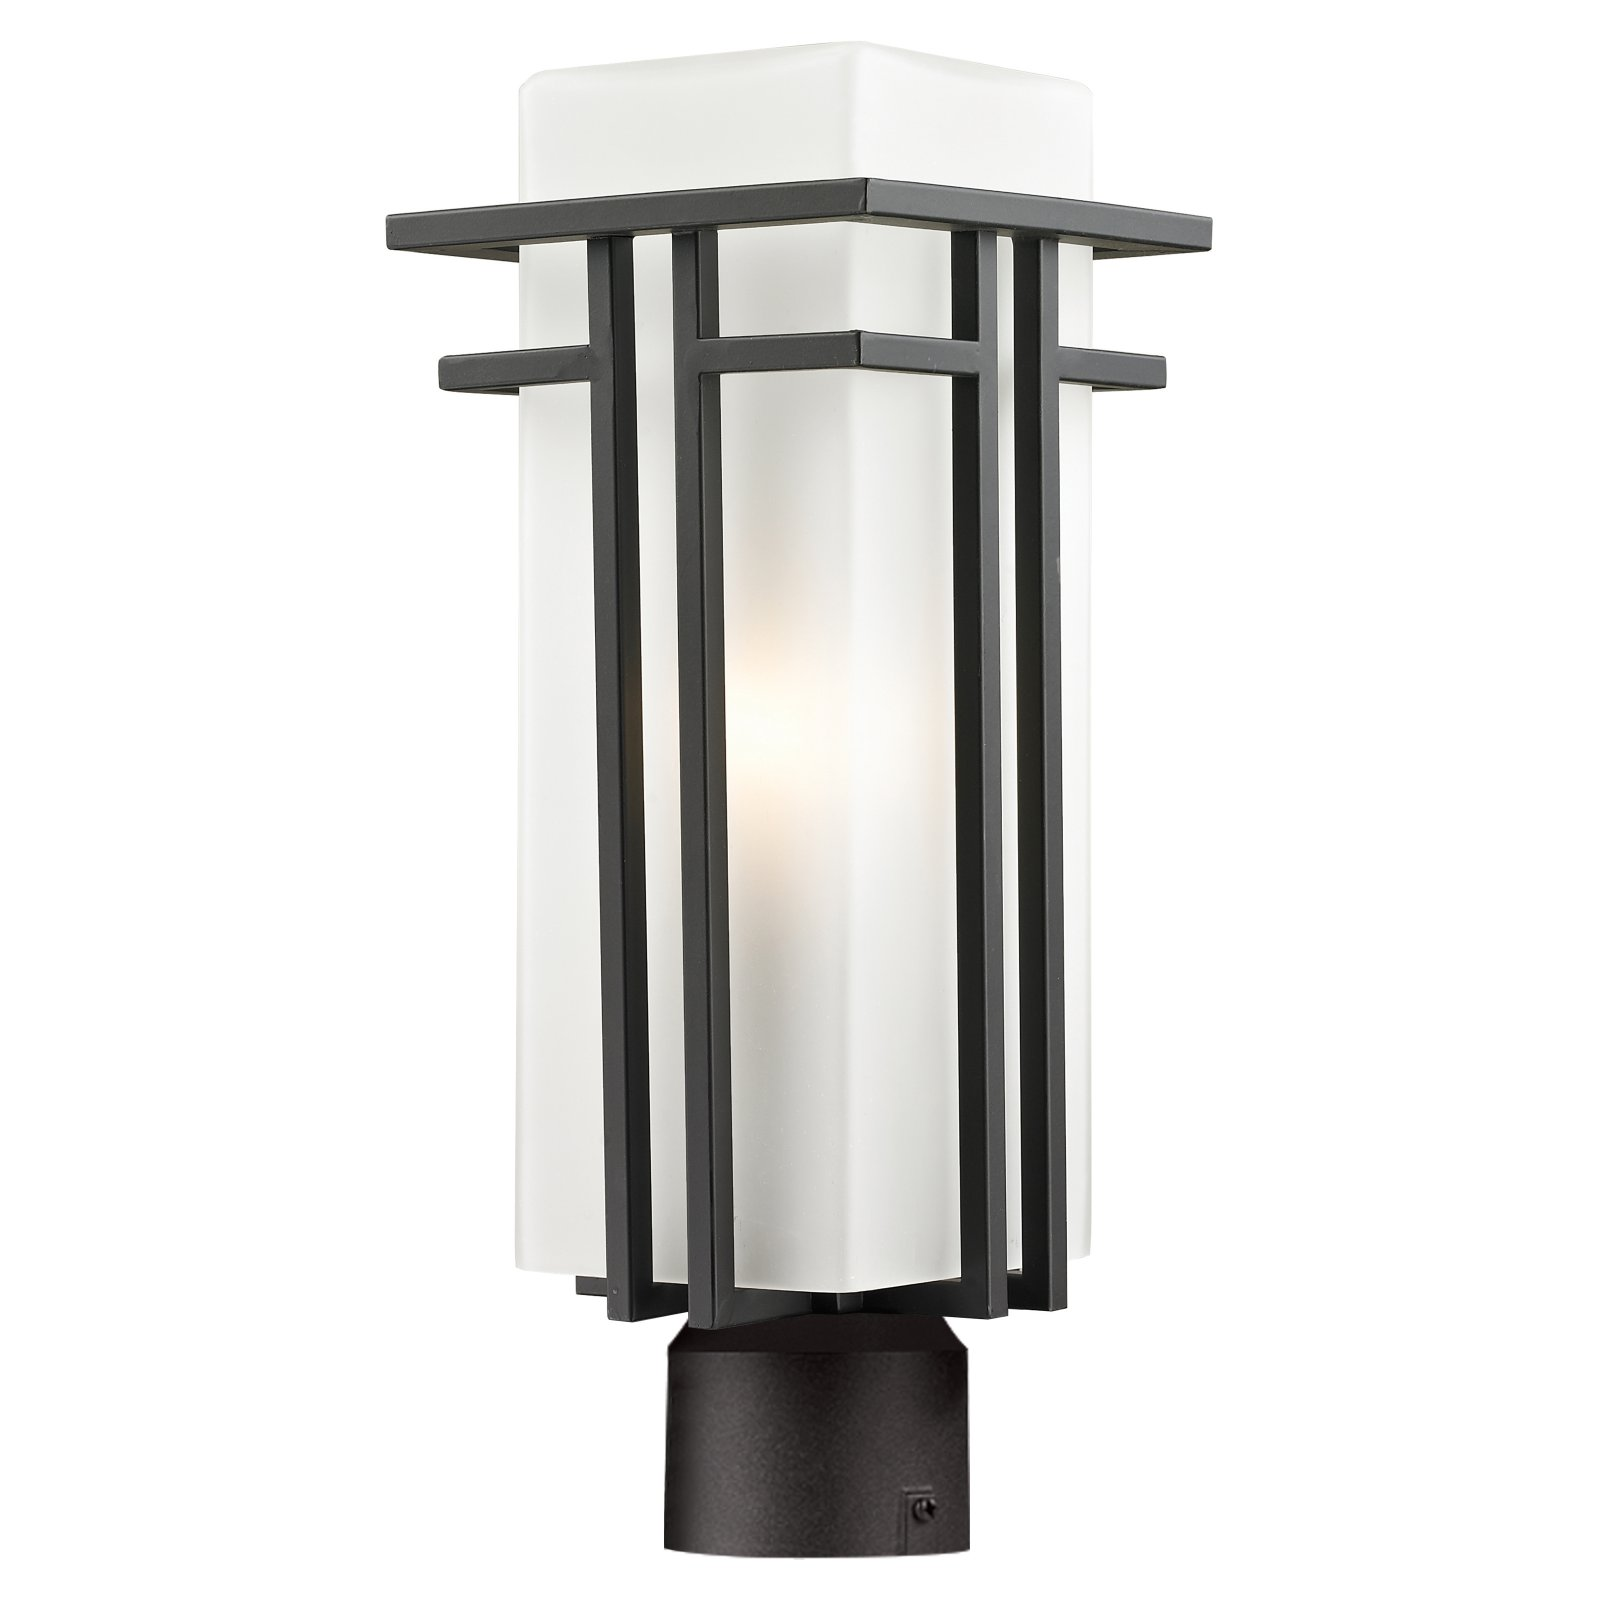 Z-Lite Abbey 550PHB-ORBZ-R Outdoor Post Light by Z Lite